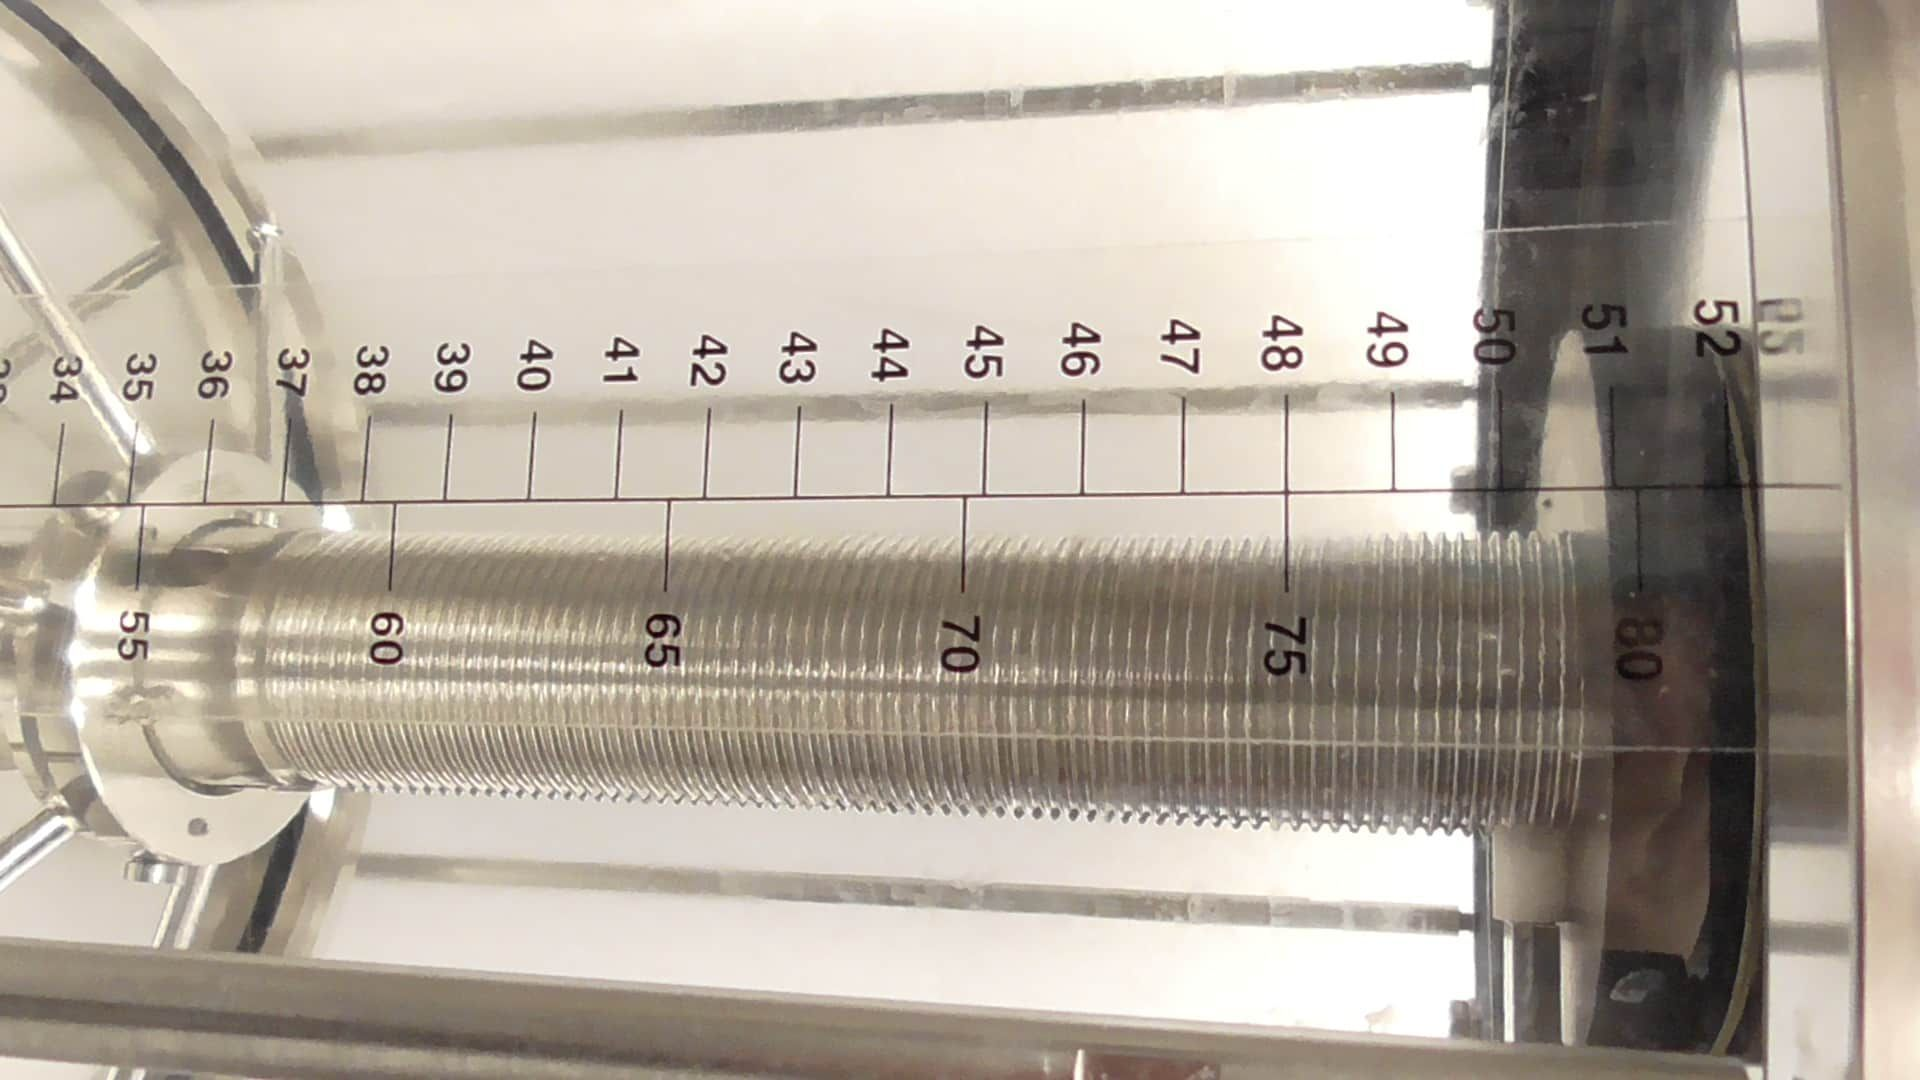 Amersham BPG 80 Liter Chromatography Column